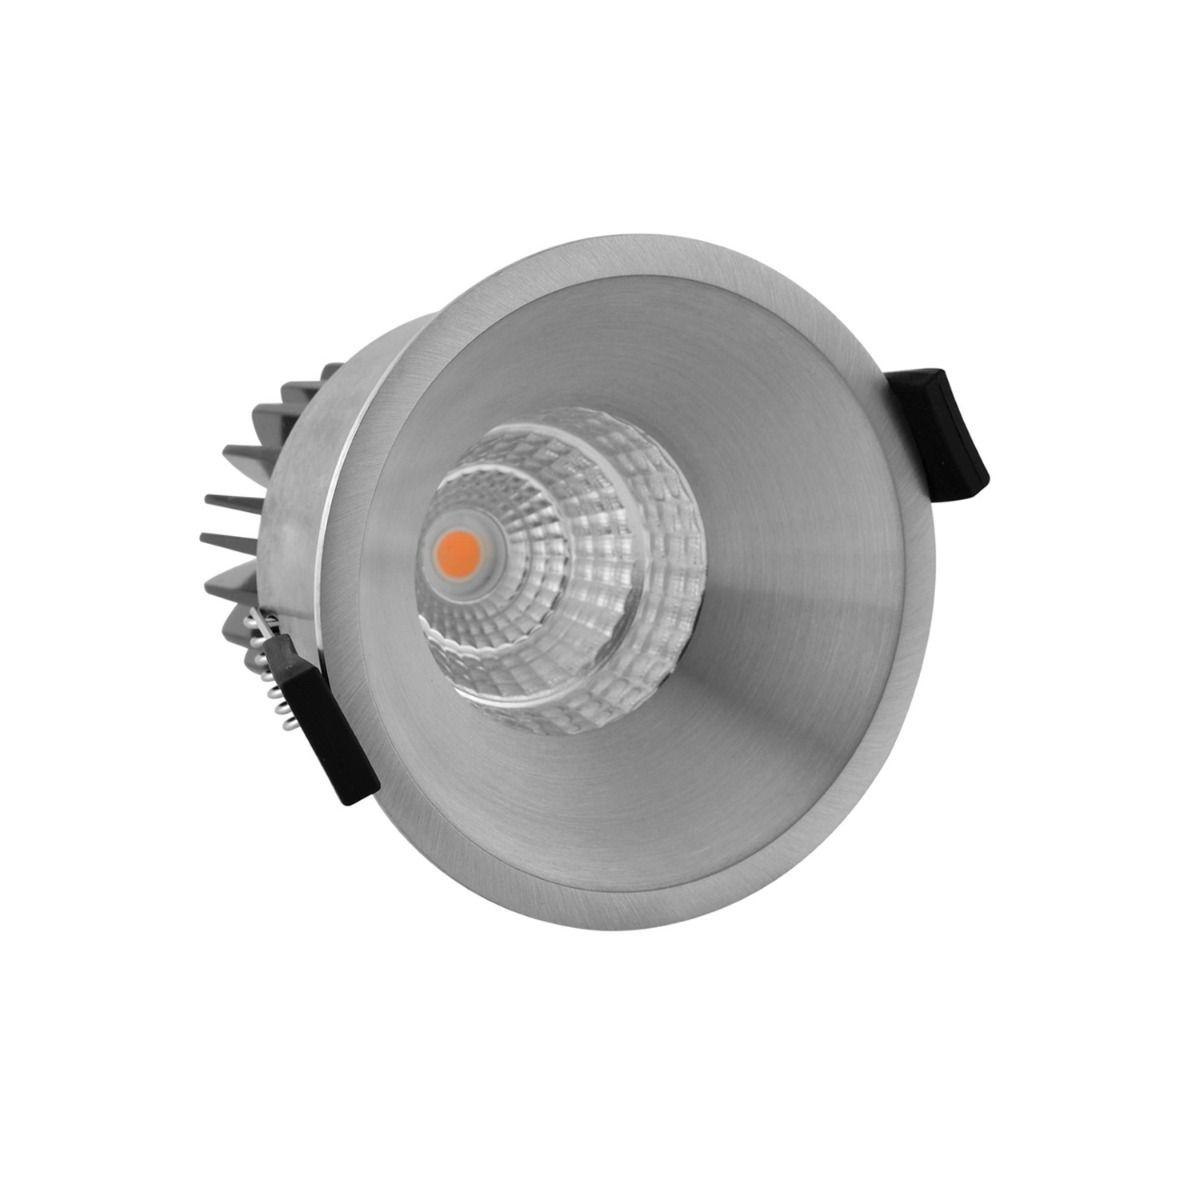 Noxion LED-Spot Starlight IP54 2700K Aluminium 6W | Höchste Farbwiedergabe - Dimmbar